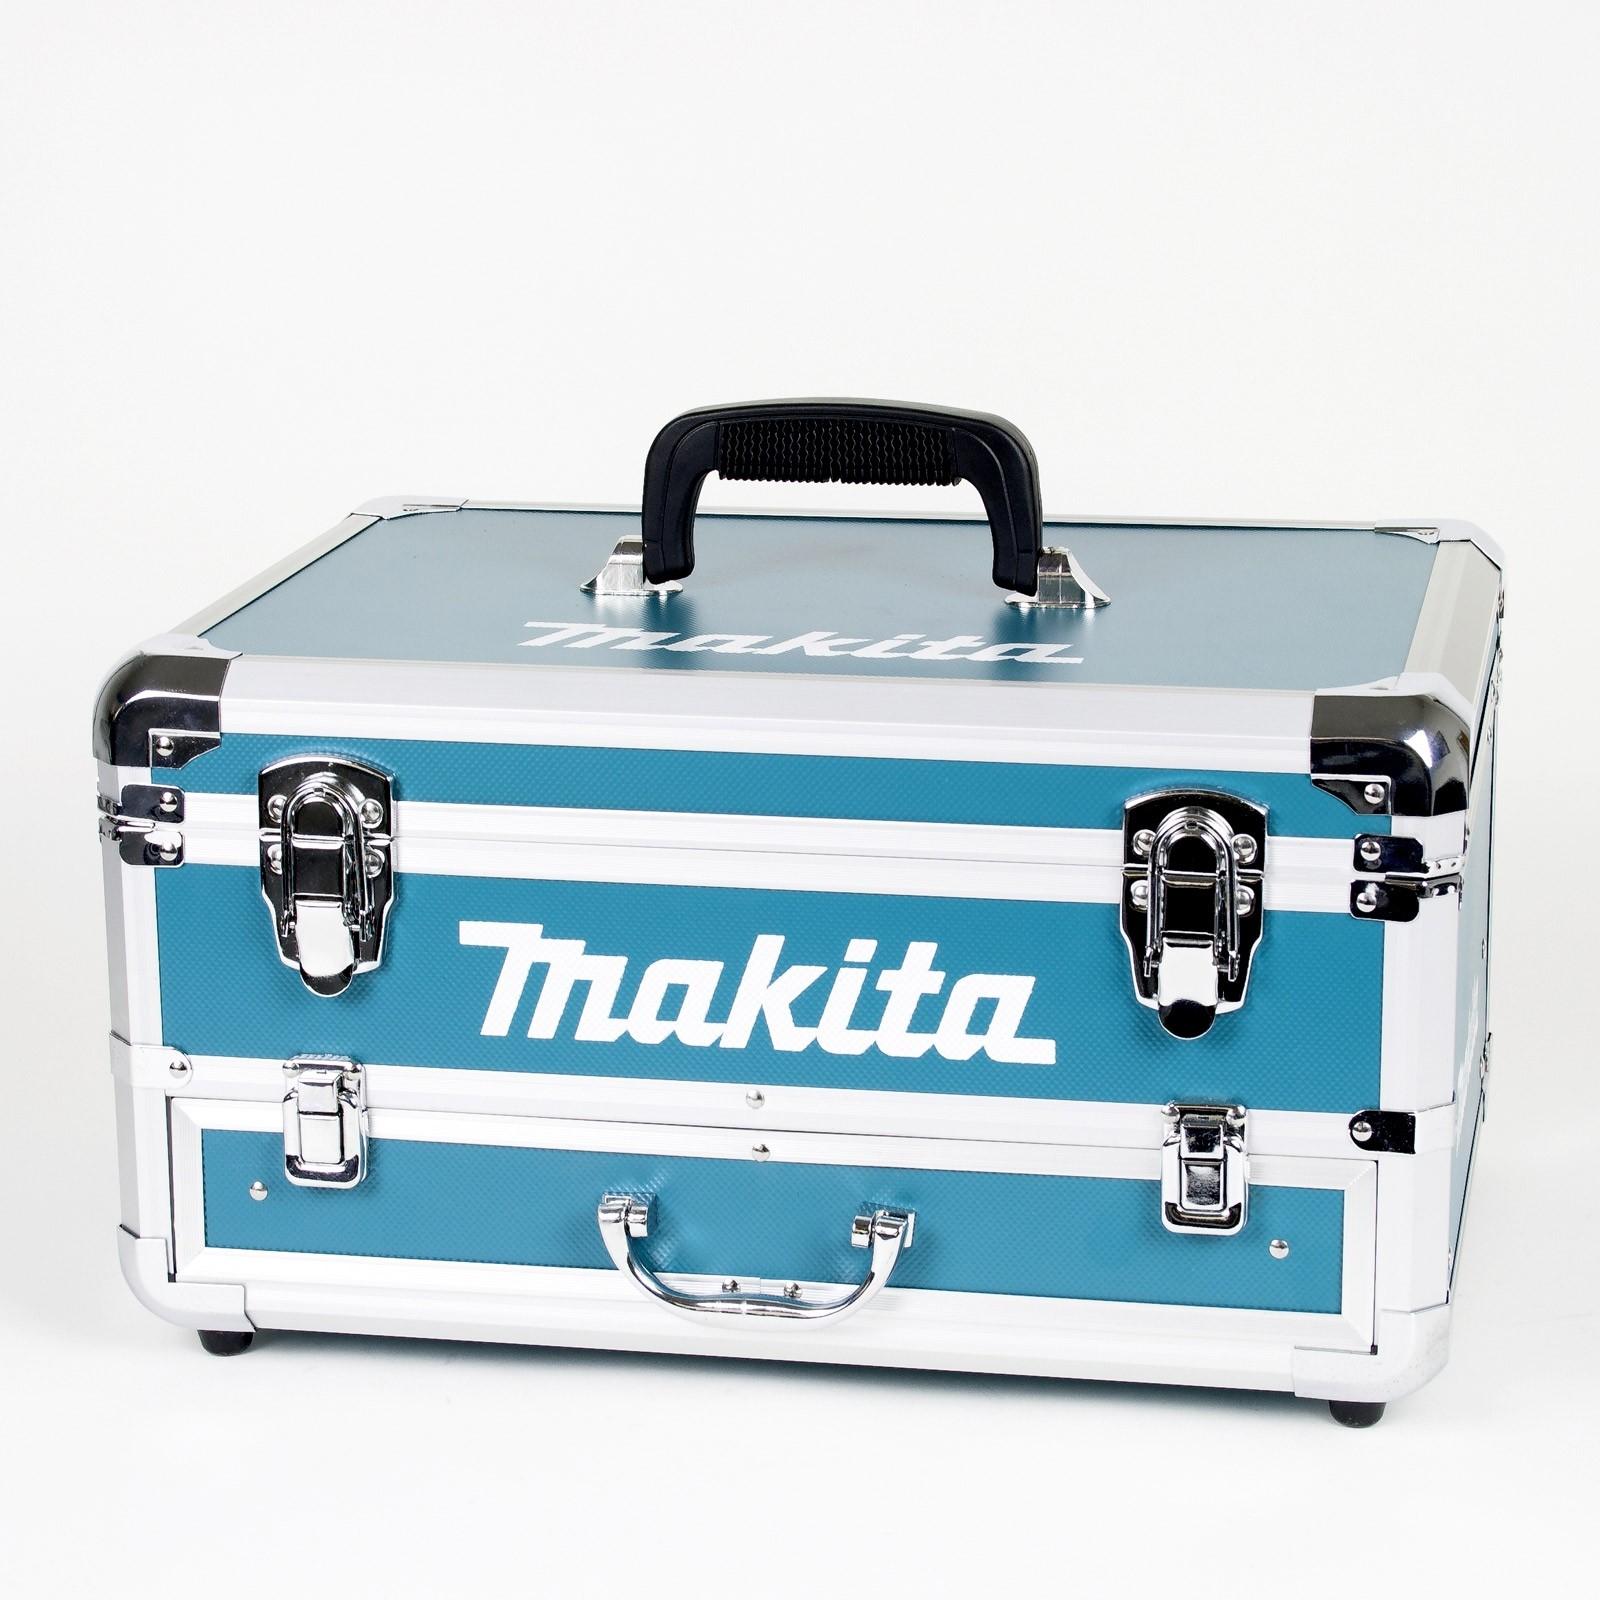 Makita Akku Schlagbohrschrauber 18 V Im Alukoffer Dhp453rfx2 96 Tlg